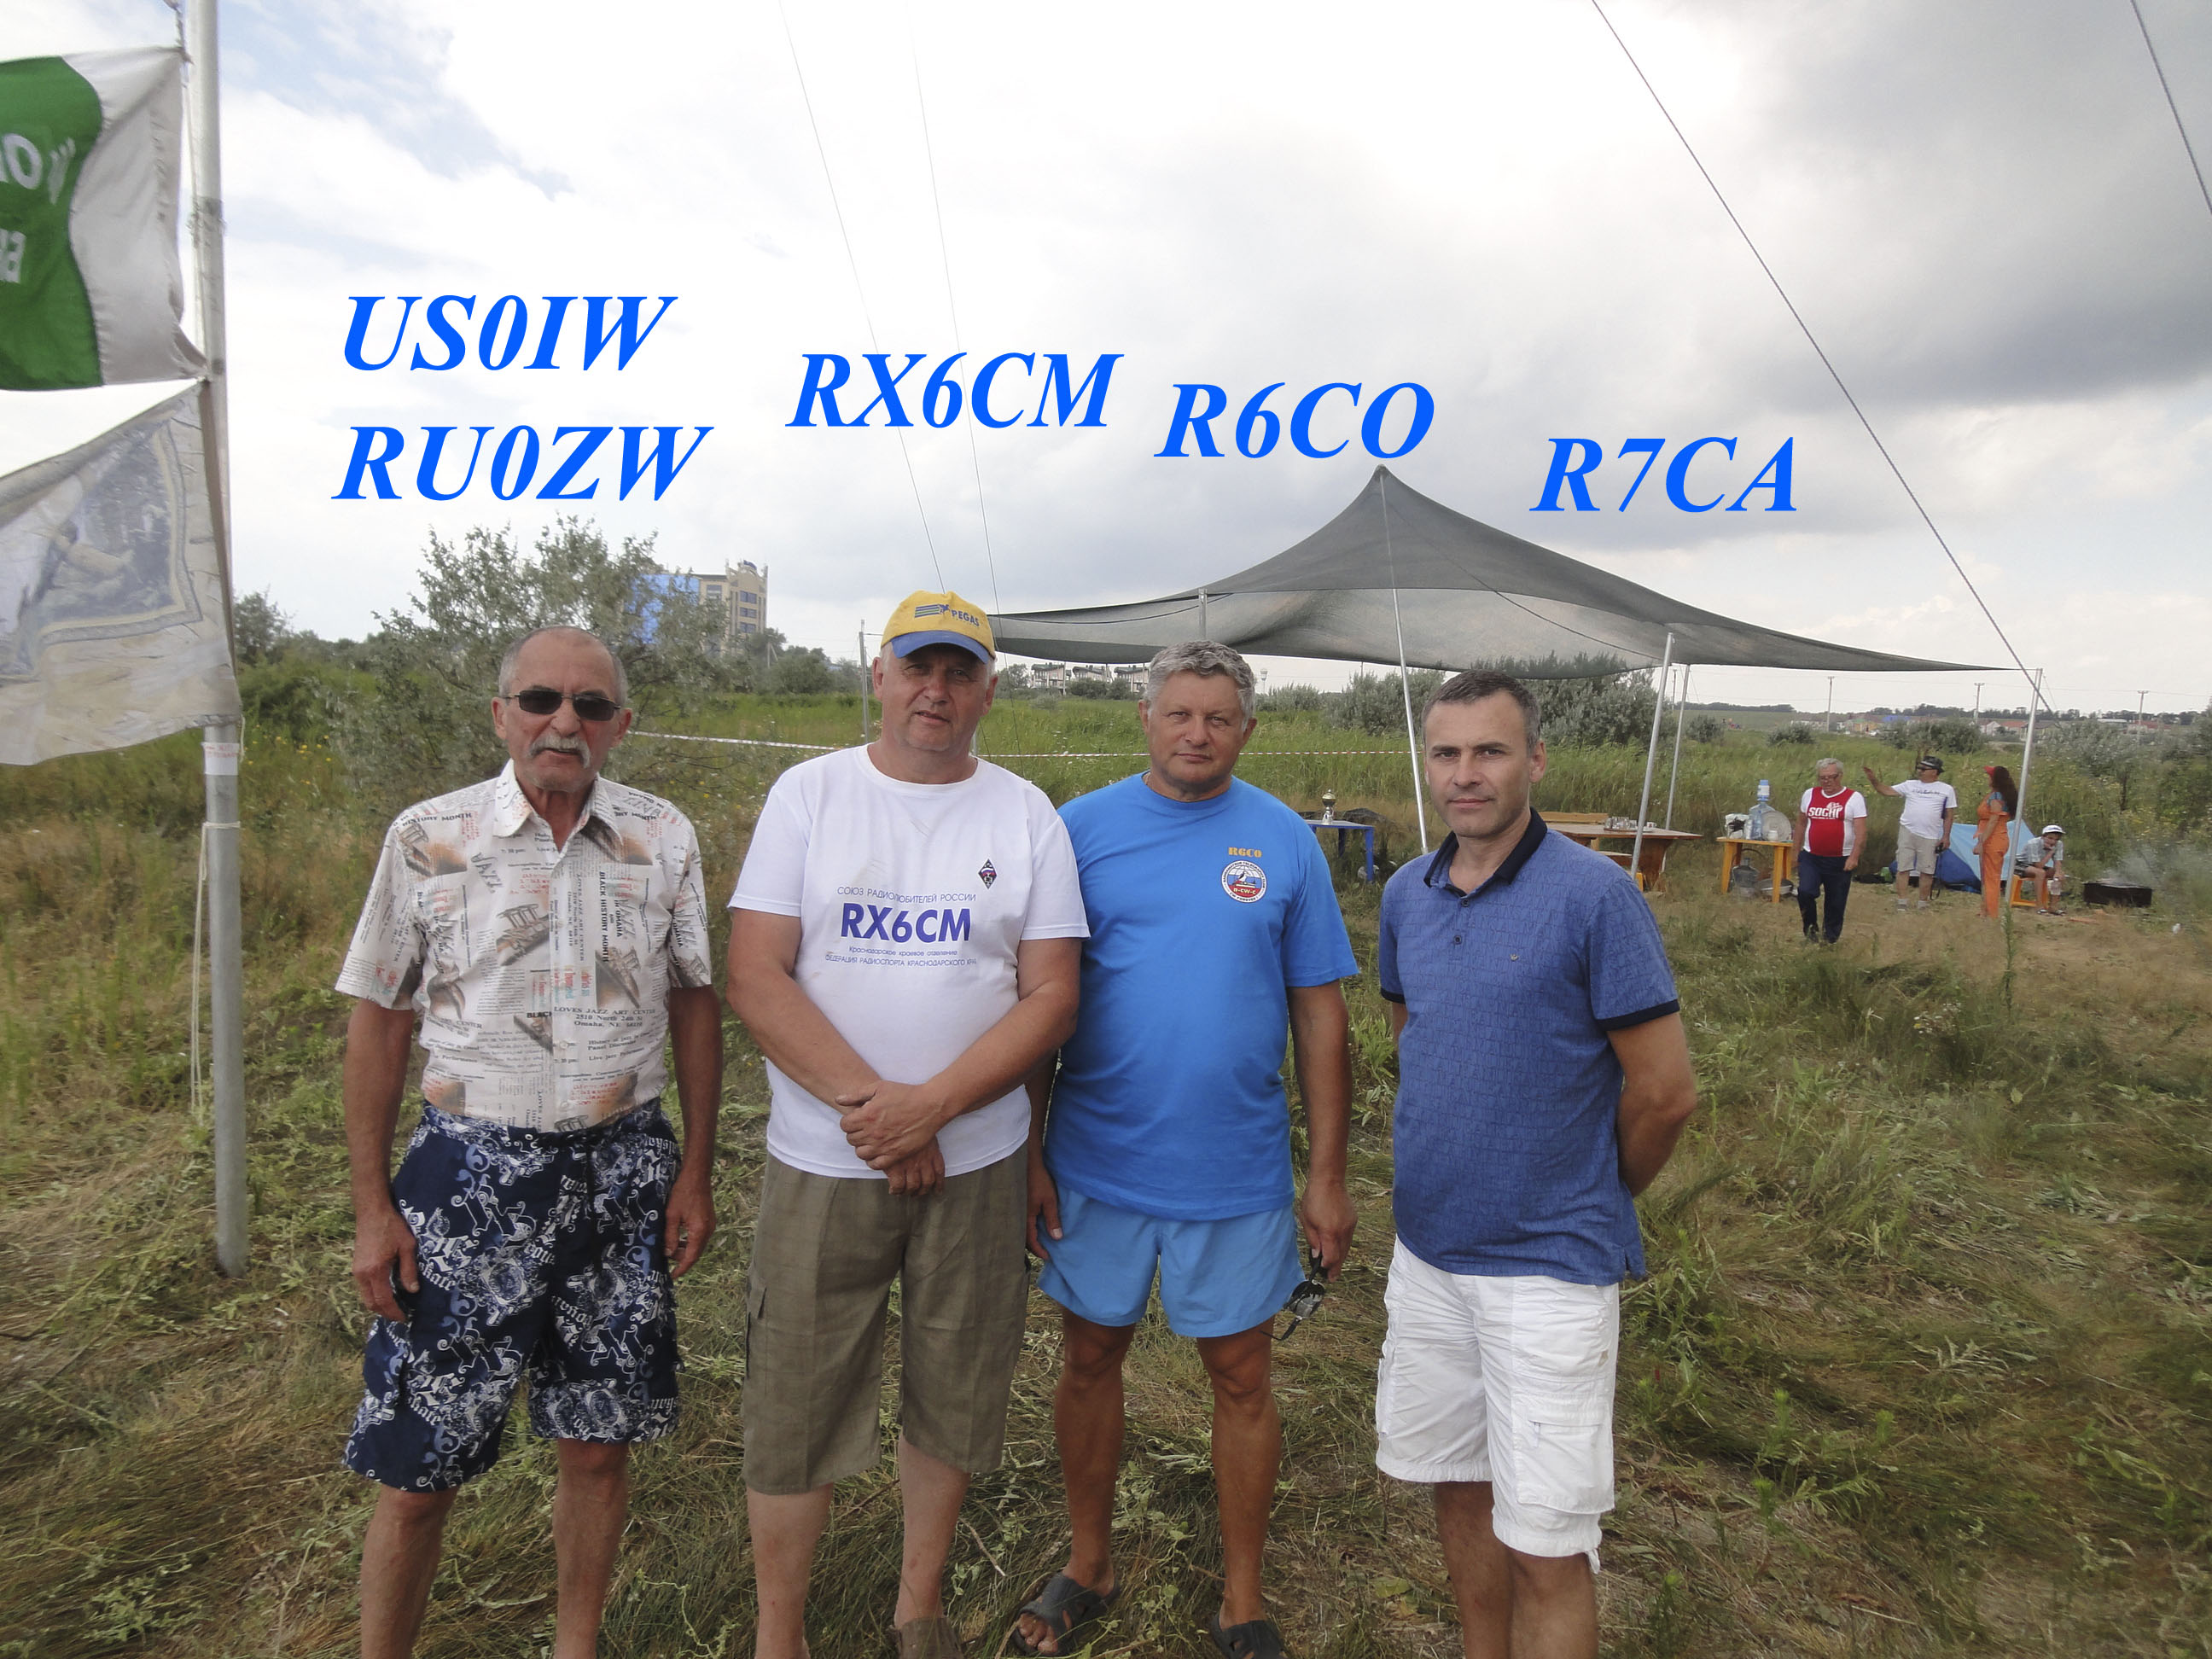 Нажмите на изображение для увеличения.  Название:Слёт RCWC.jpg Просмотров:10 Размер:768.4 Кб ID:229811